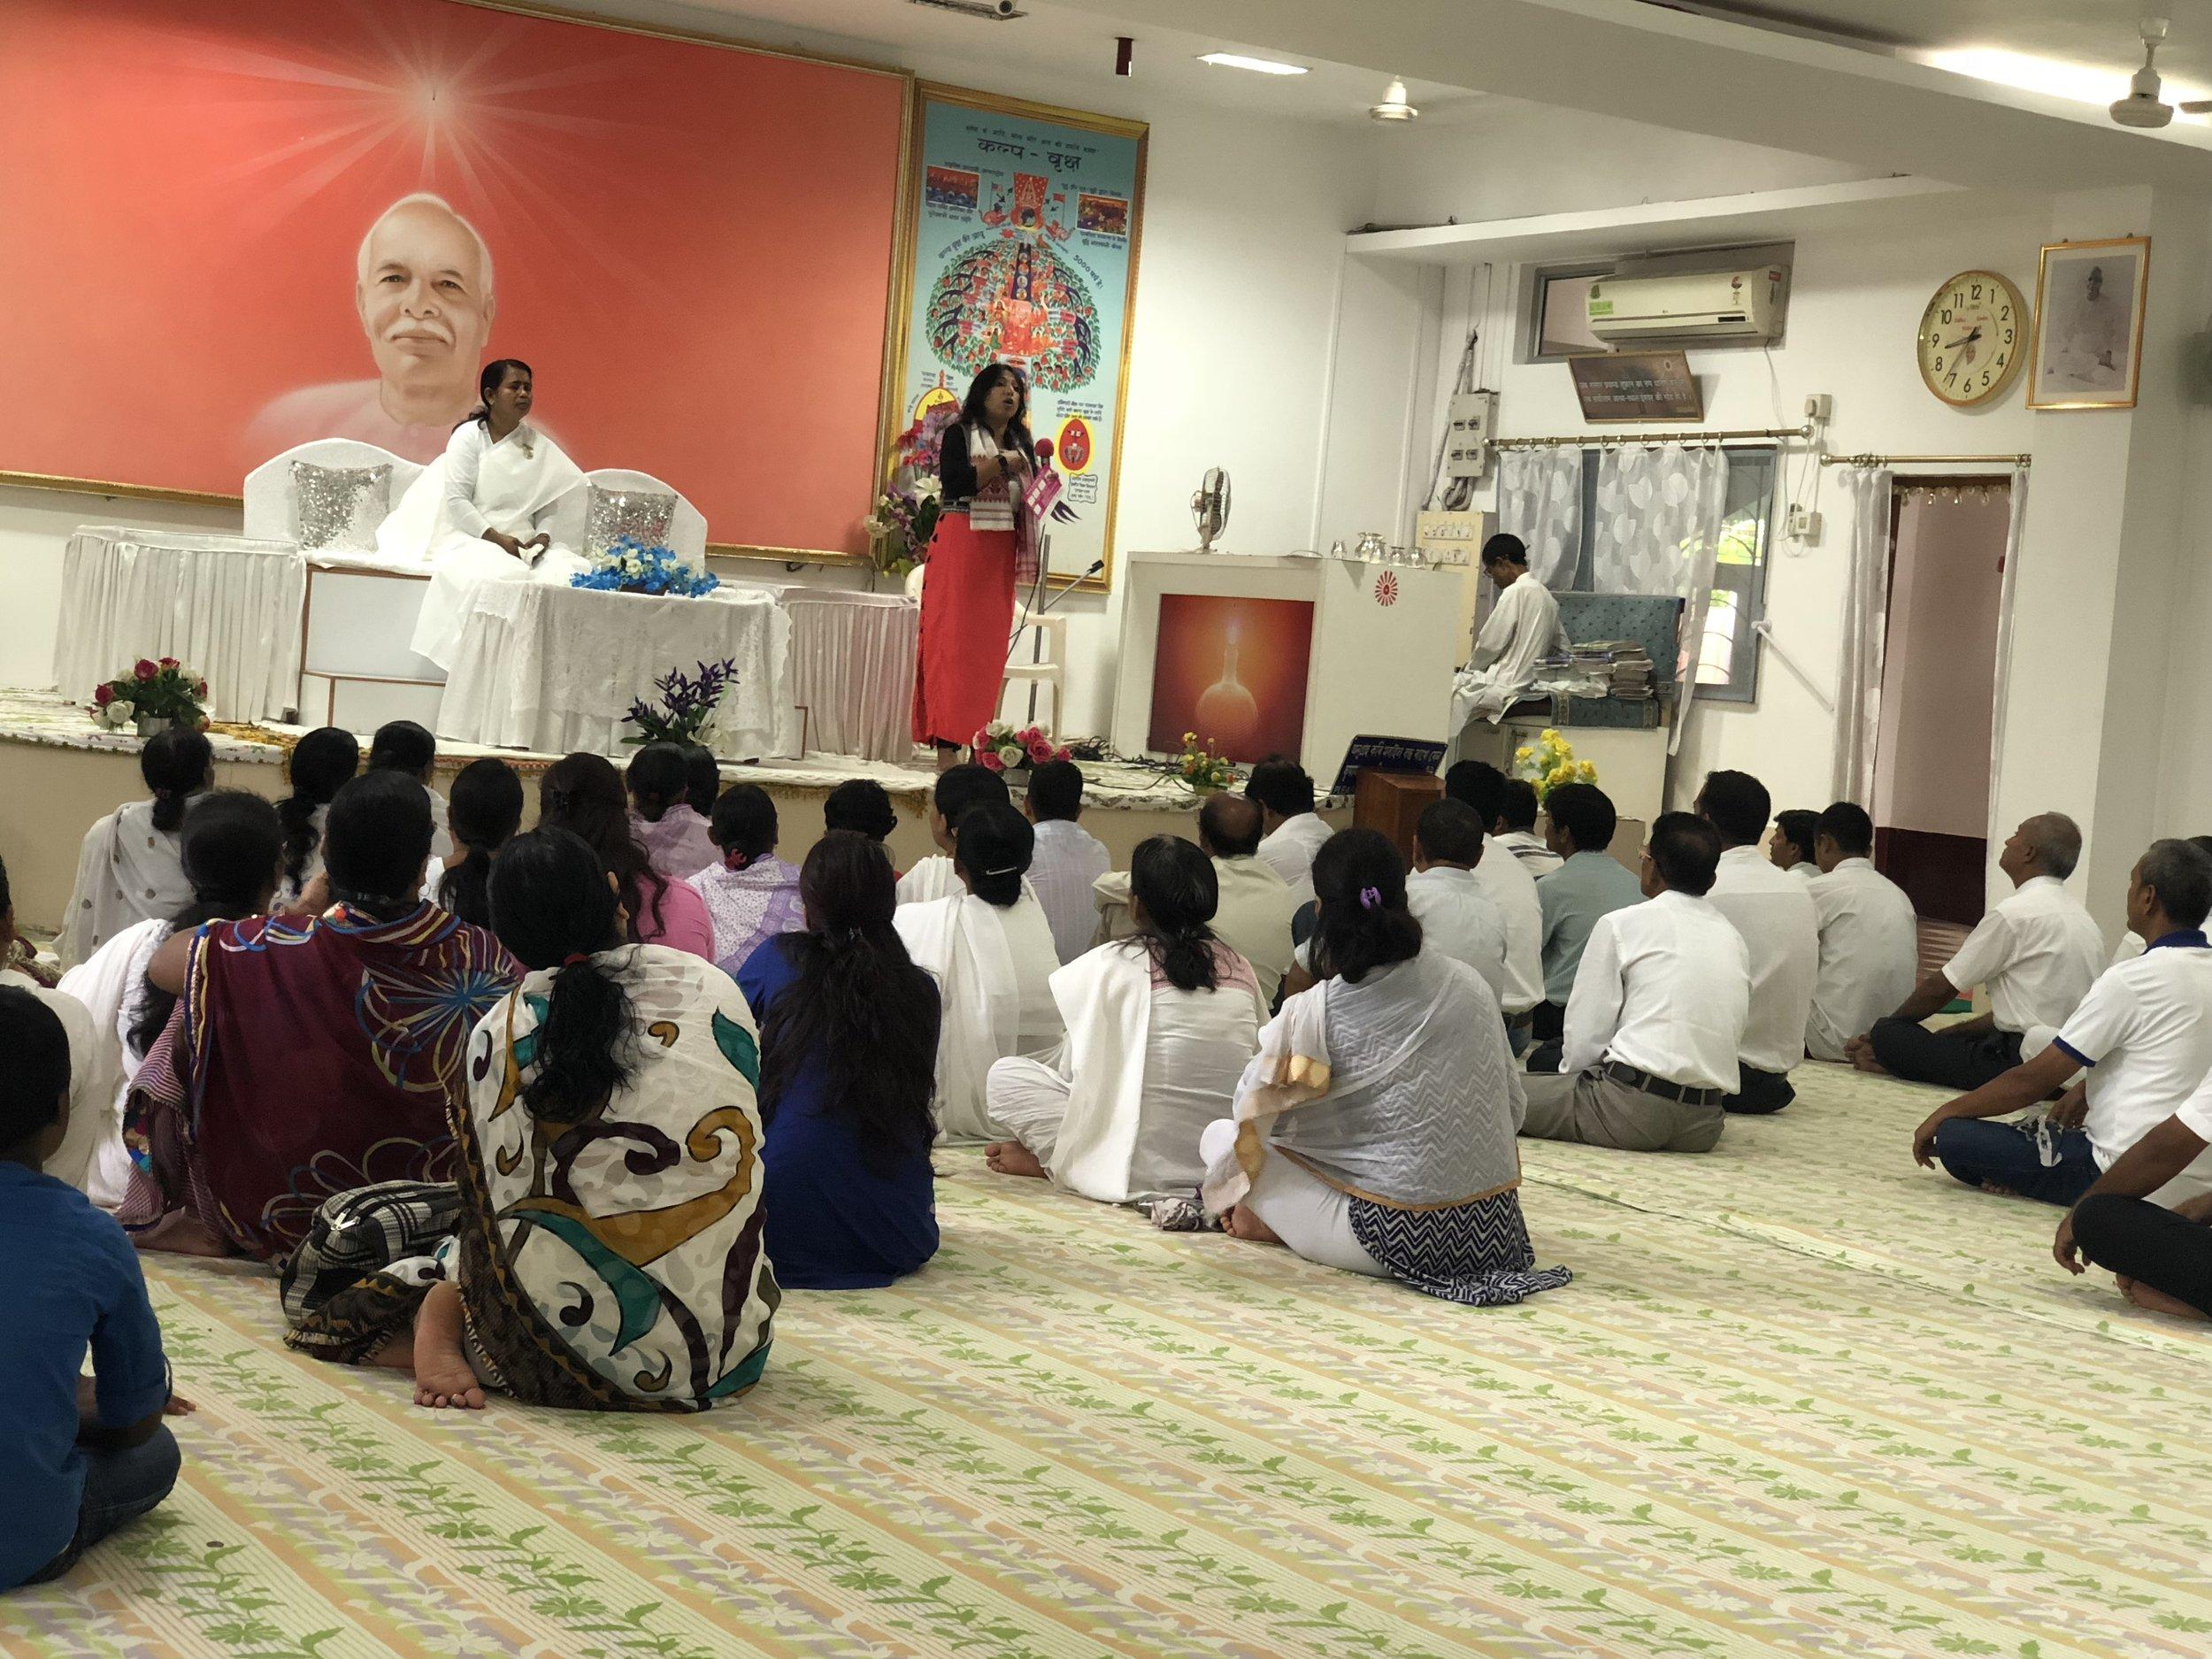 Event: Organized by Bodhana at Prajapati Brahma Kumaris, Guwahati.